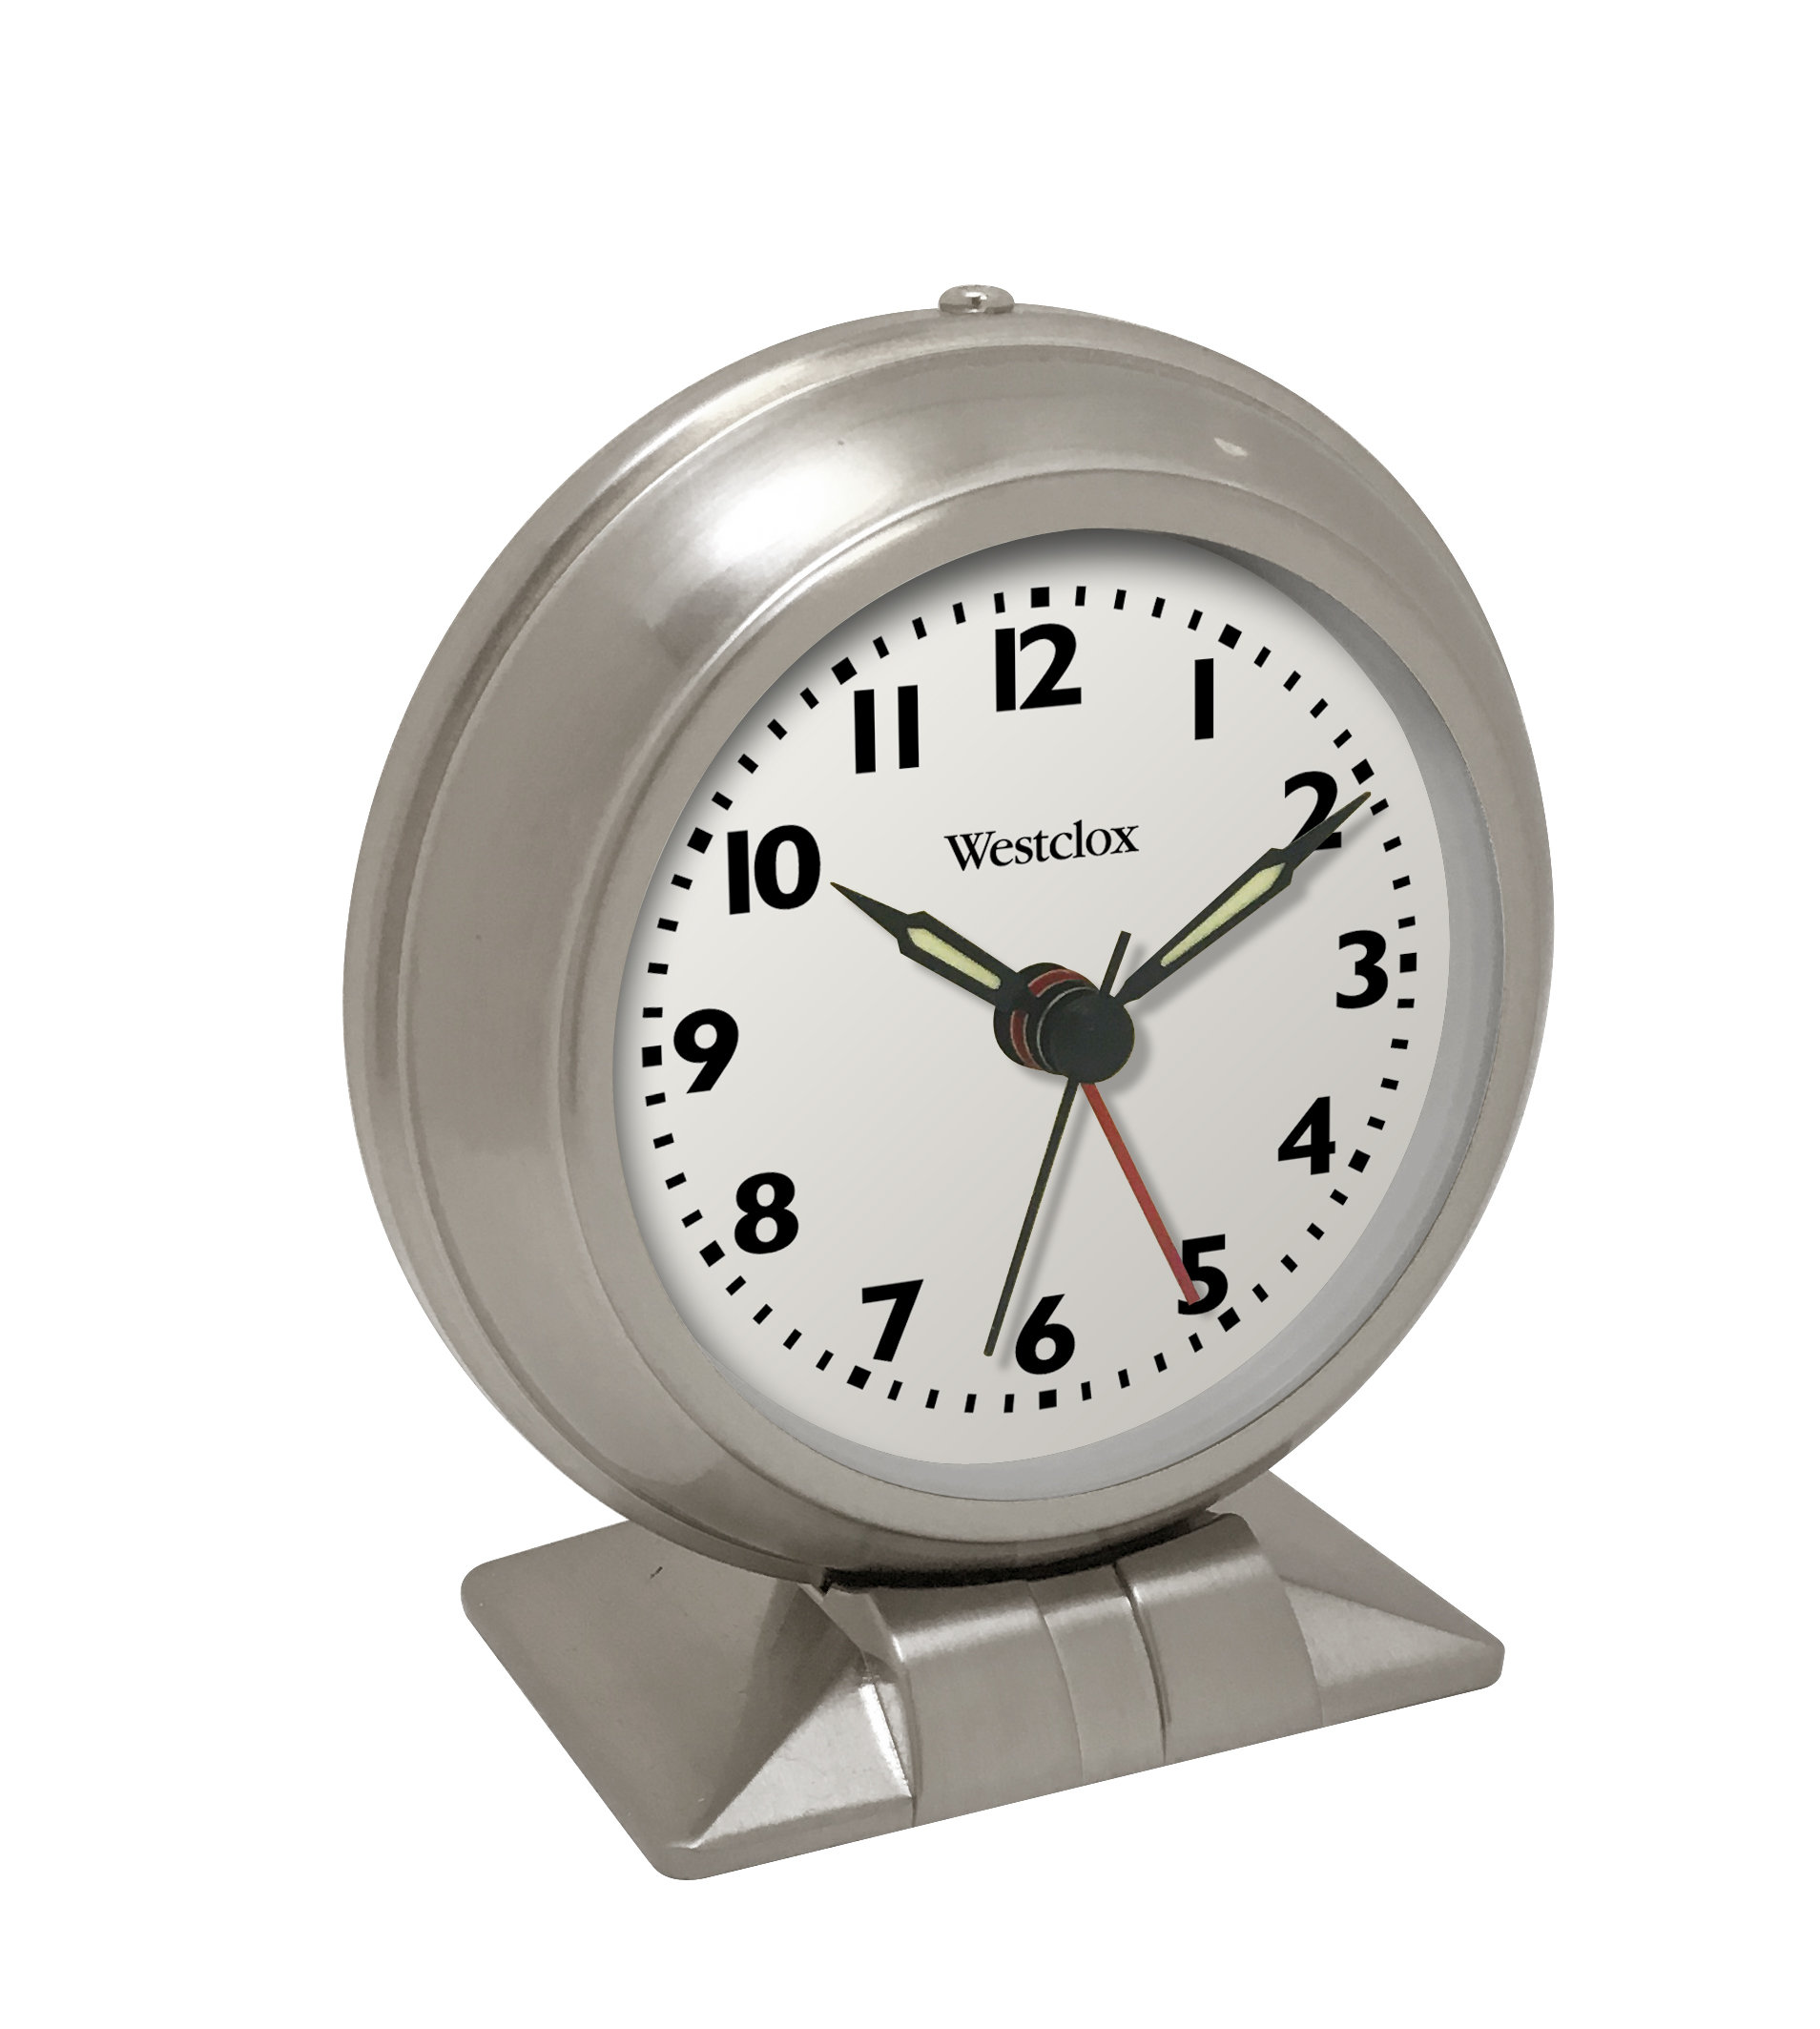 Westclox Classic Alarm Clock Small Size 90010 90010